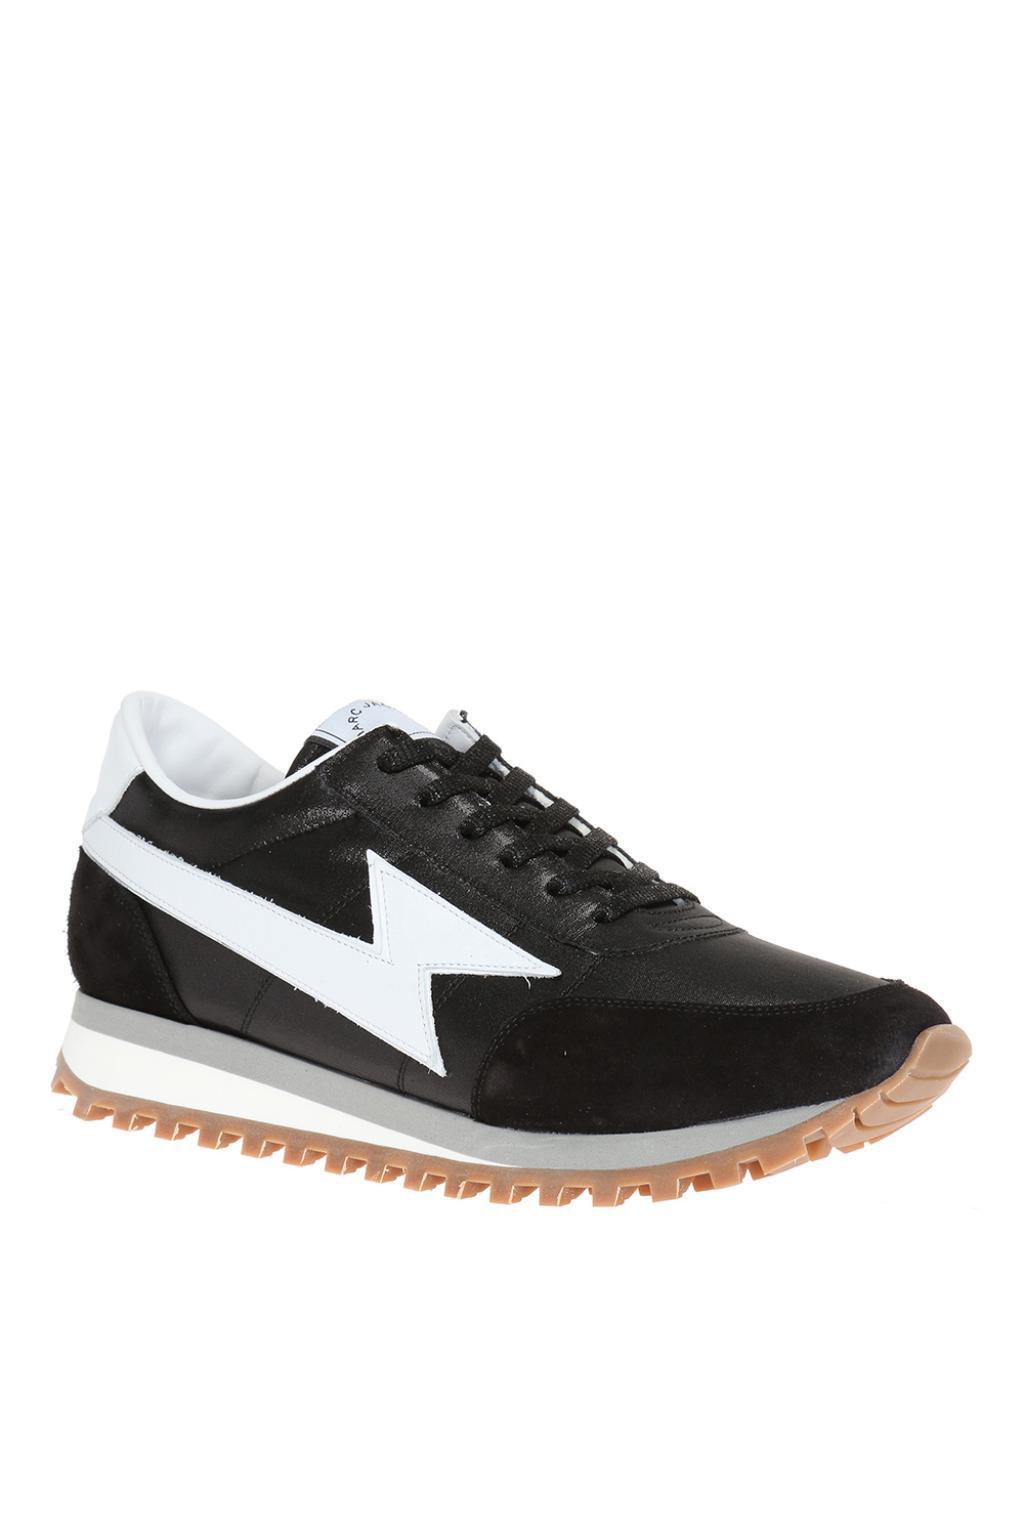 lightning patch sneakers - Black Marc Jacobs dCodZCkG